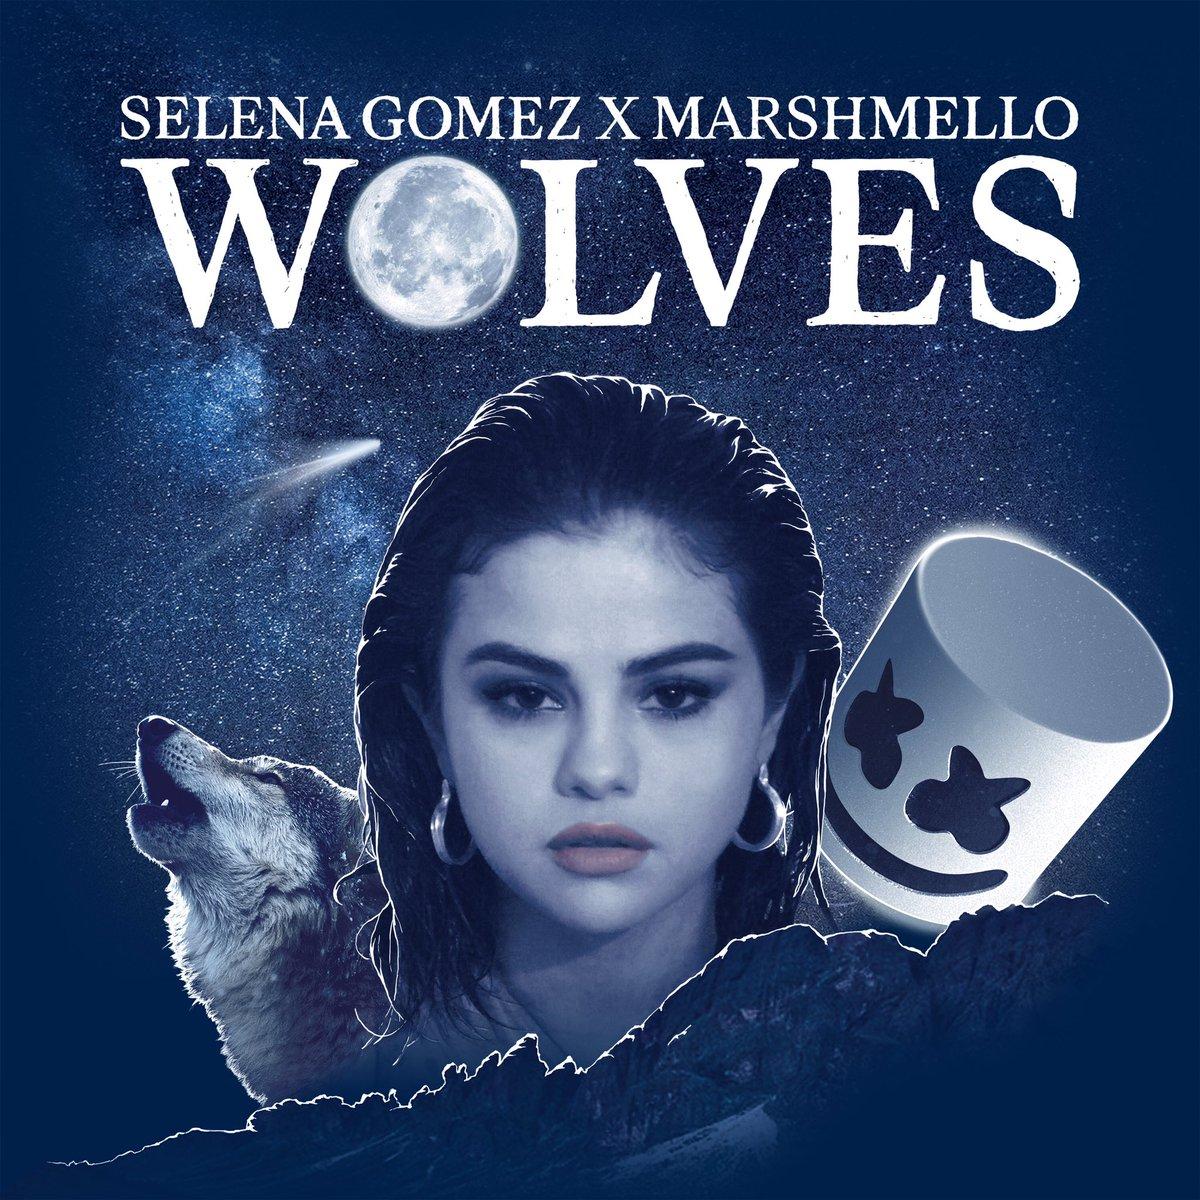 Selena Gomez #ShortBuzzz